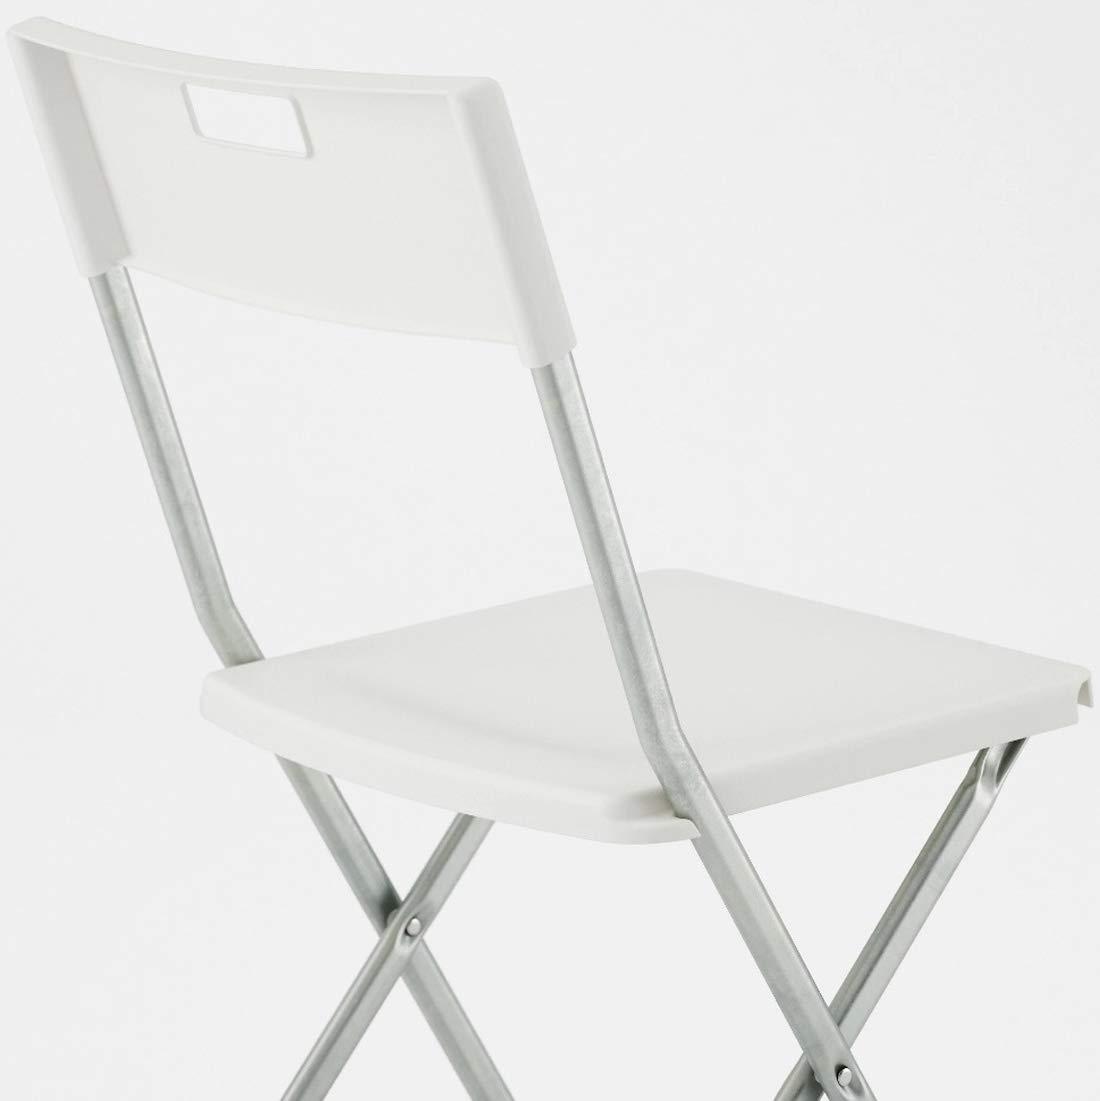 Porta Sedie Pieghevoli Ikea.Sedie Sf Savino Filippo 6 Sedie Sedia Poltrona Pieghevole Bianca